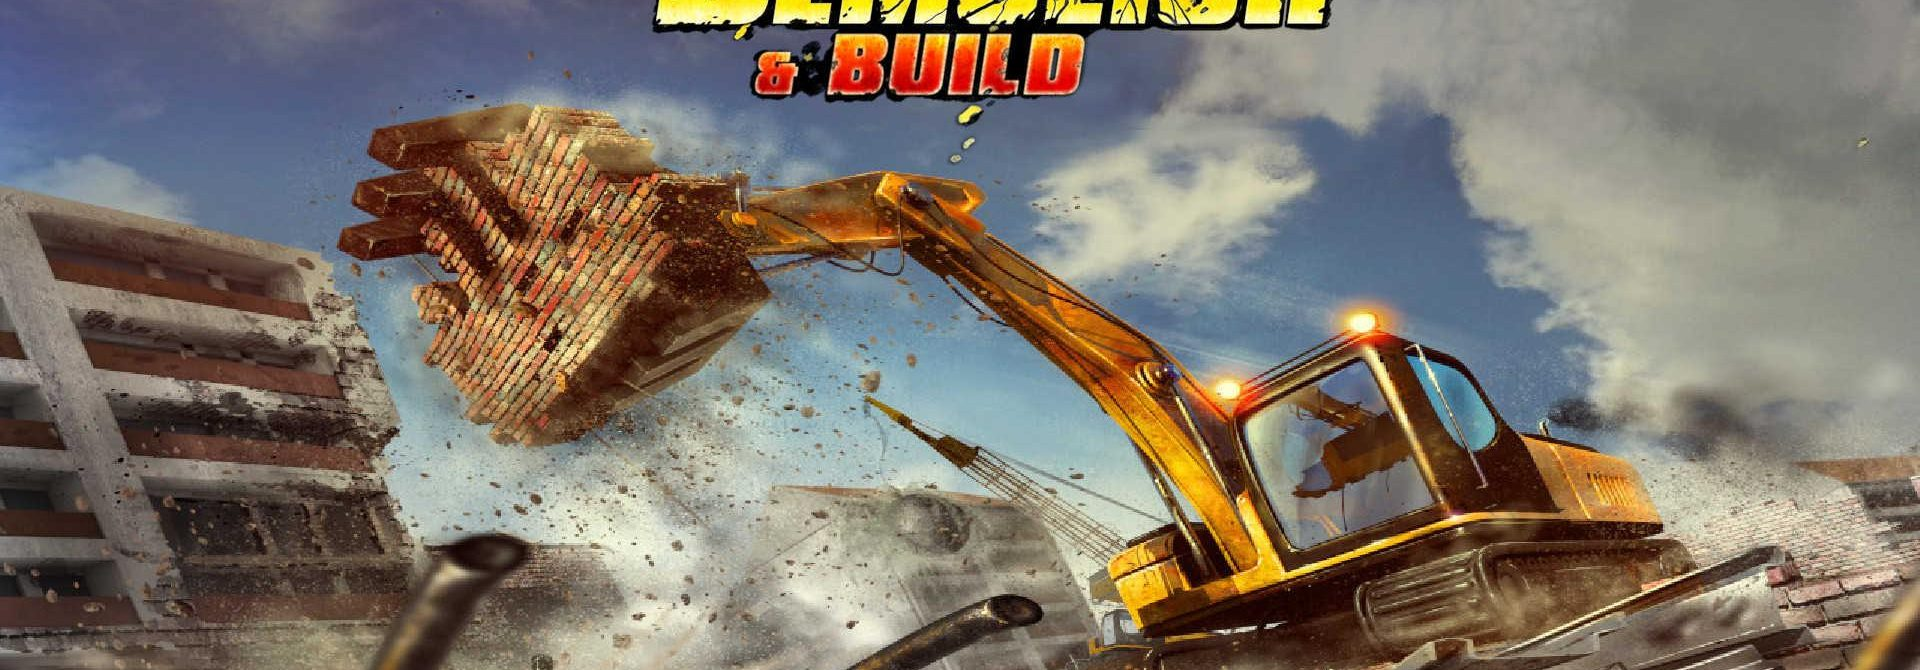 Demolish & Build – a new construction simulator on Nintendo Switch